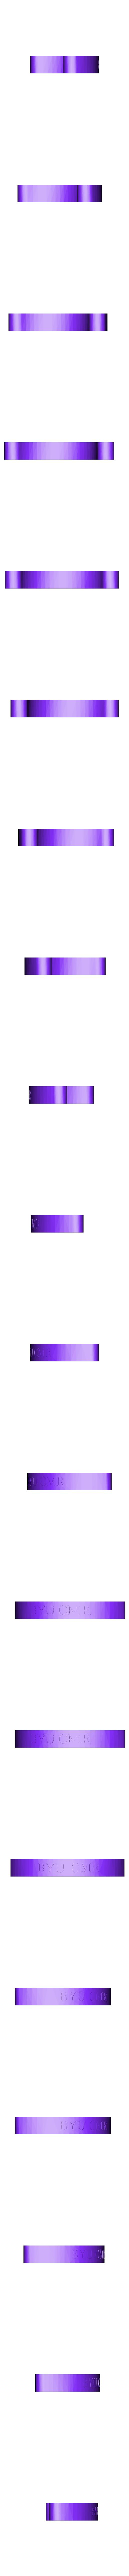 8holesMedium.STL Download free STL file CurvedLinks: Medium size circular links (LEGO Compatible) • 3D print template, byucmr